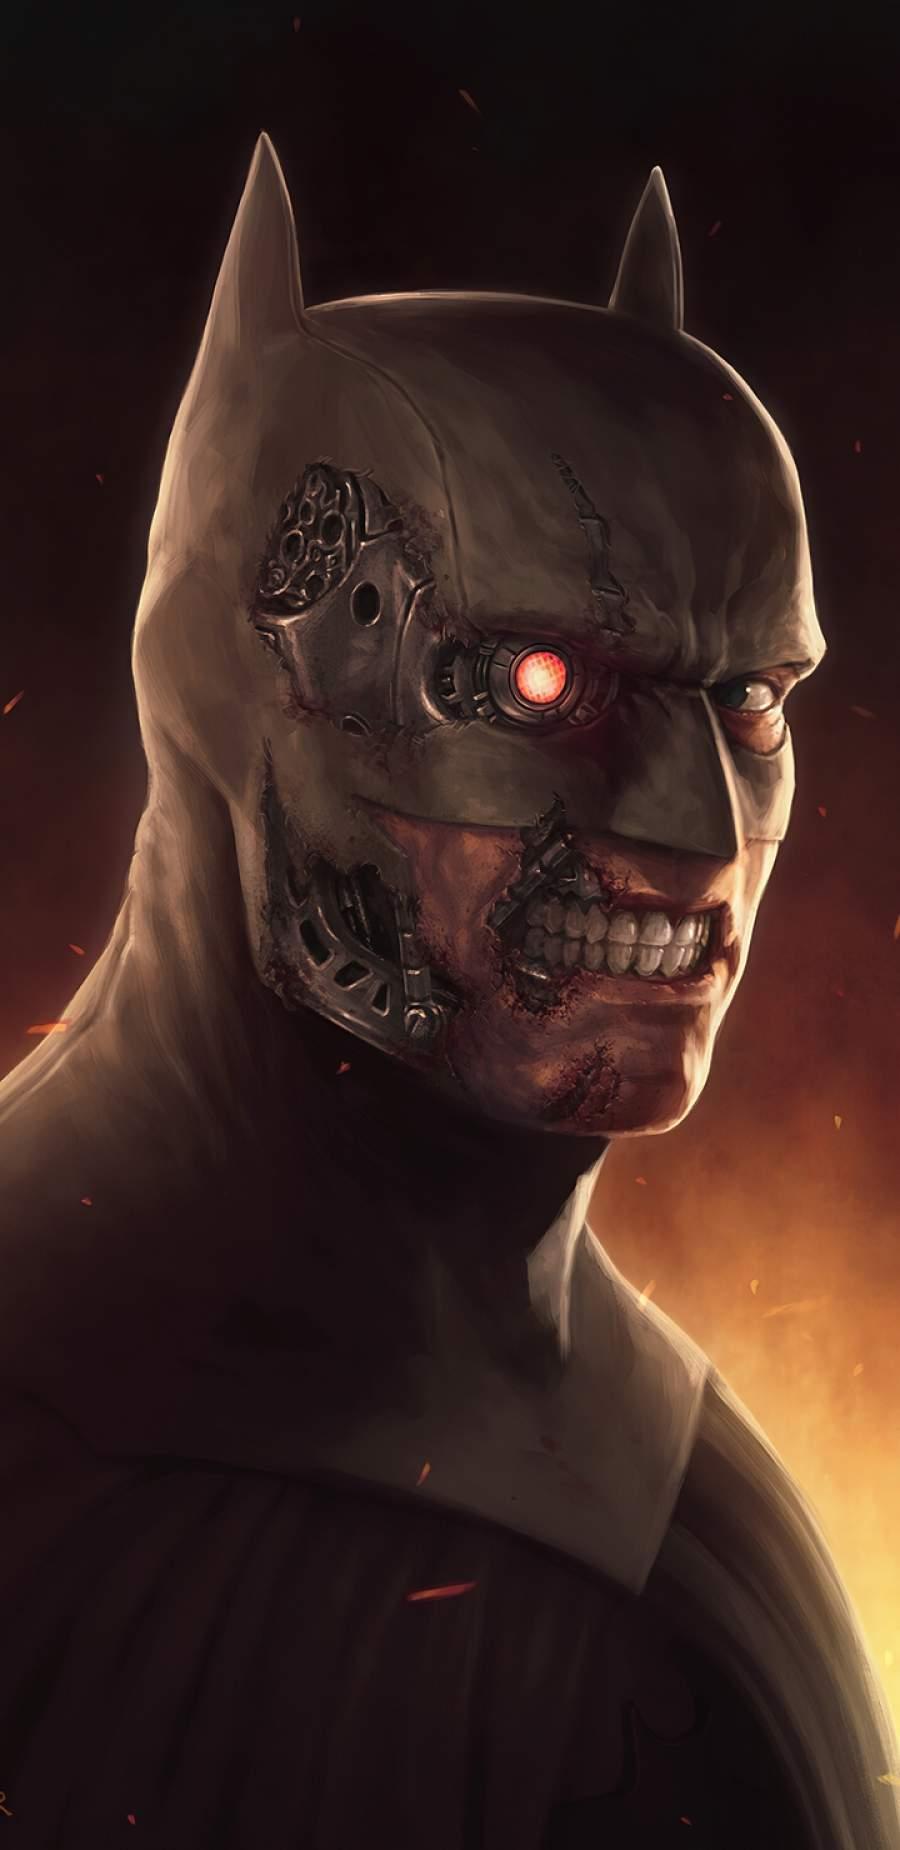 Terminator Batman iPhone Wallpaper